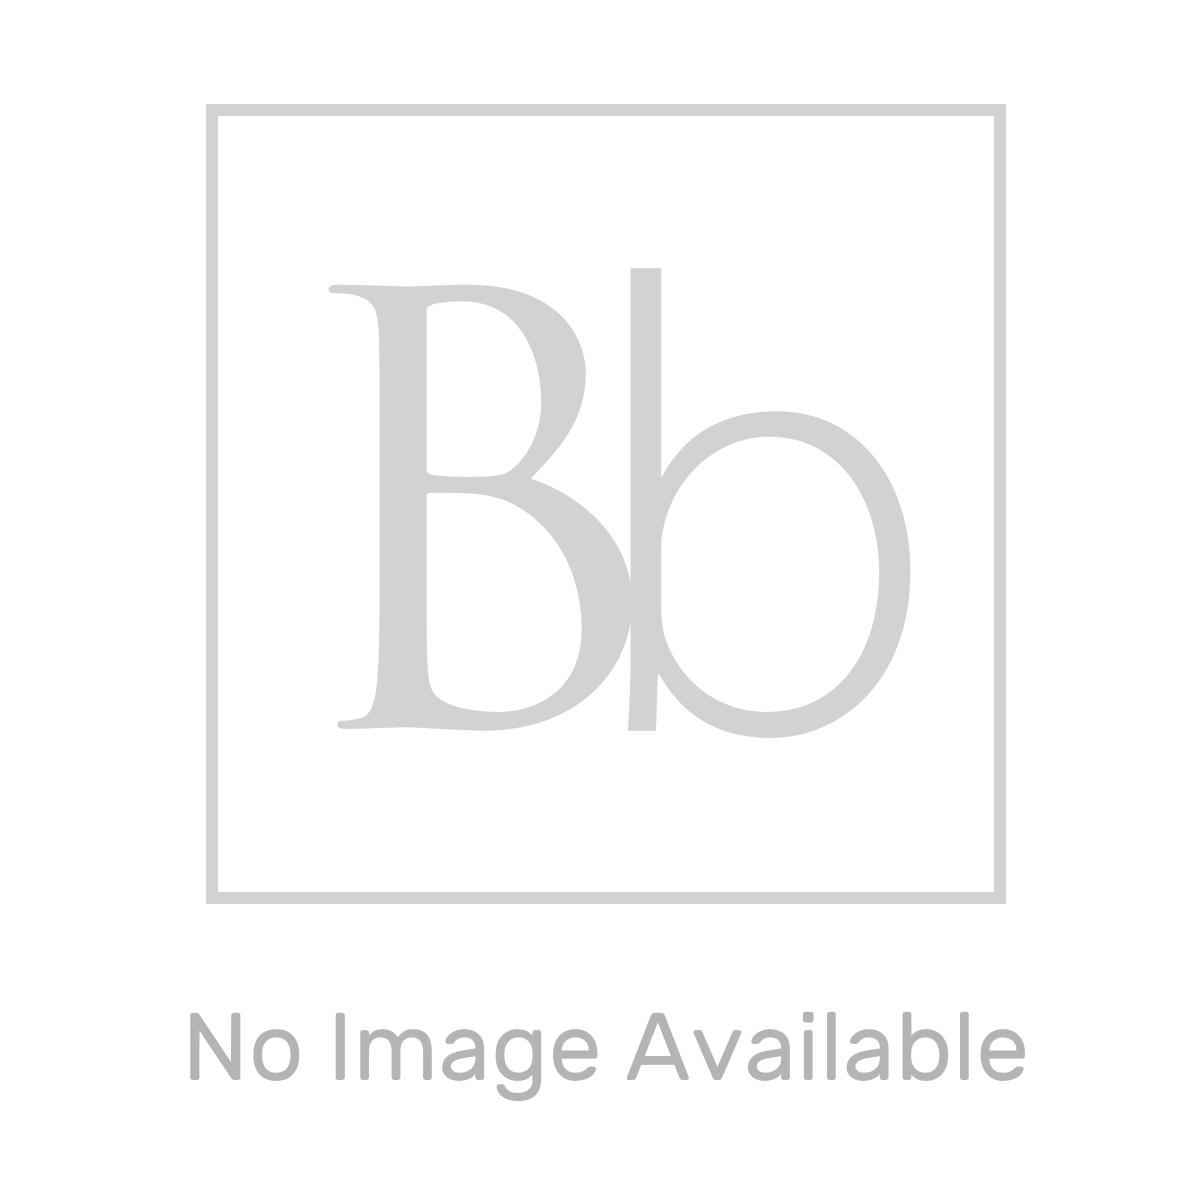 RAK Washington White Vanity Unit with Black Countertop 600mm Measurements